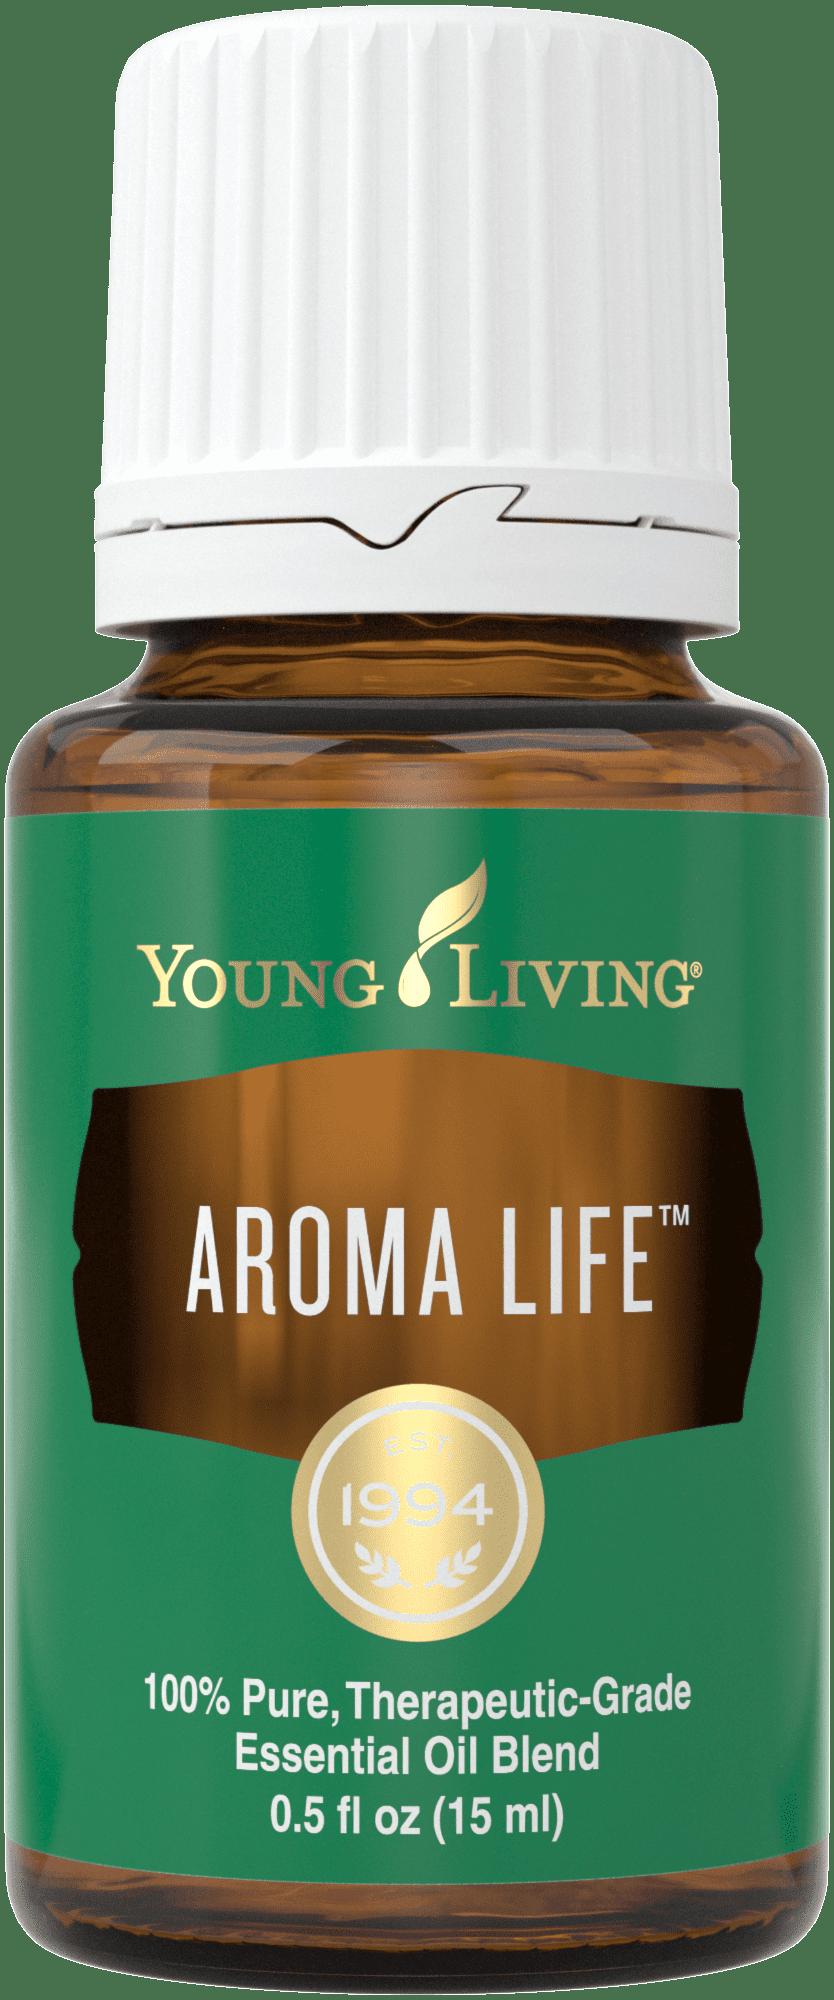 Ätherisches Öl Young Living: Aroma Life (Lebenskraft) 15ml